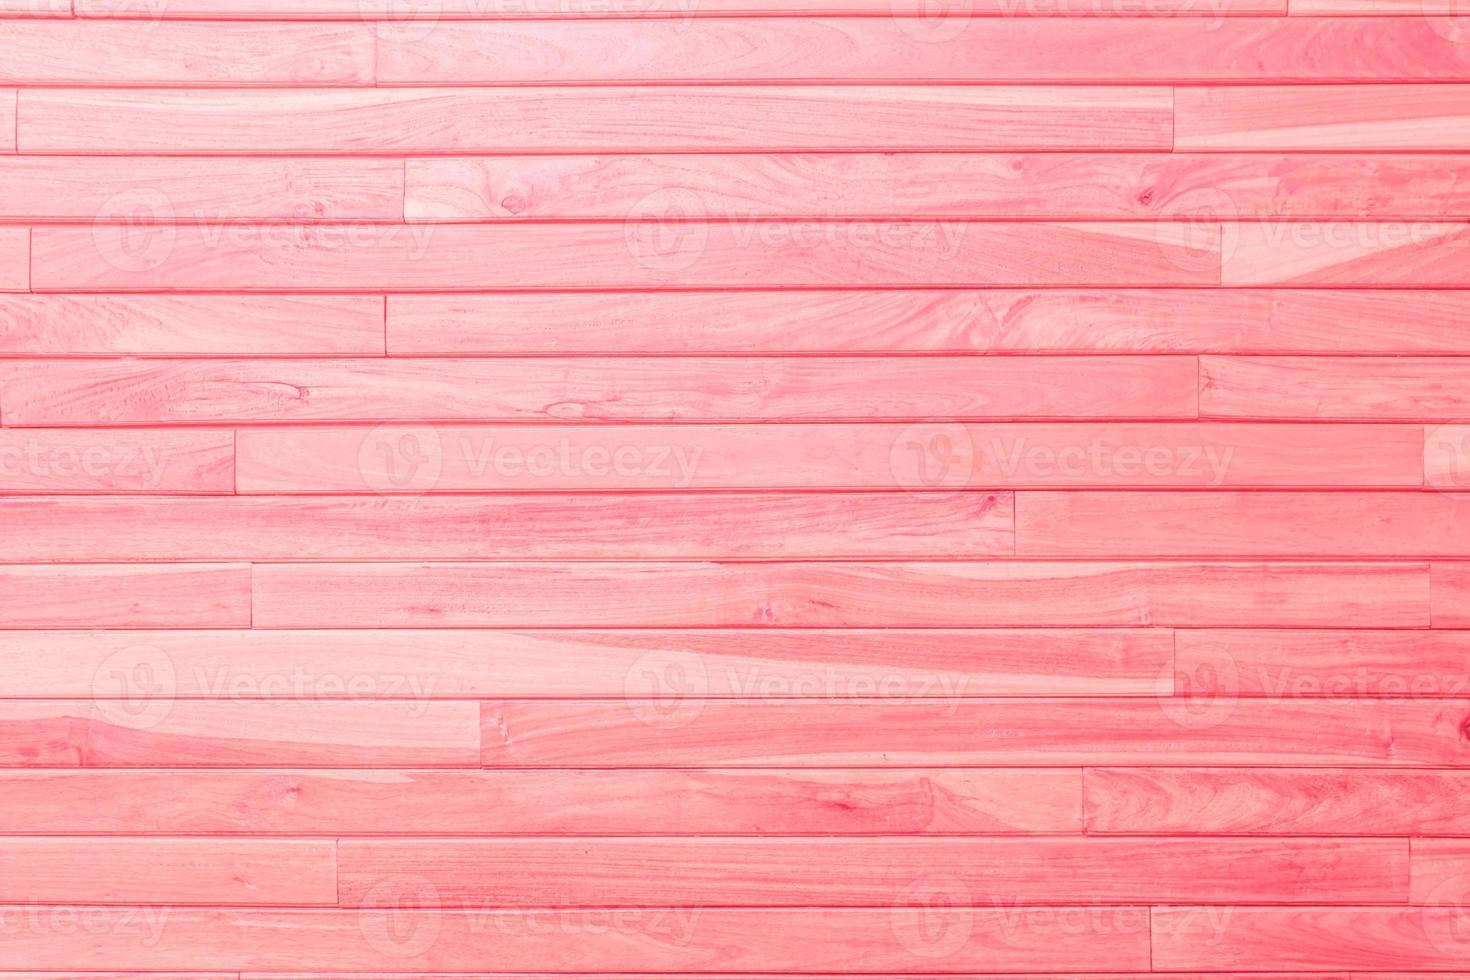 trä planka röd konsistens bakgrund foto